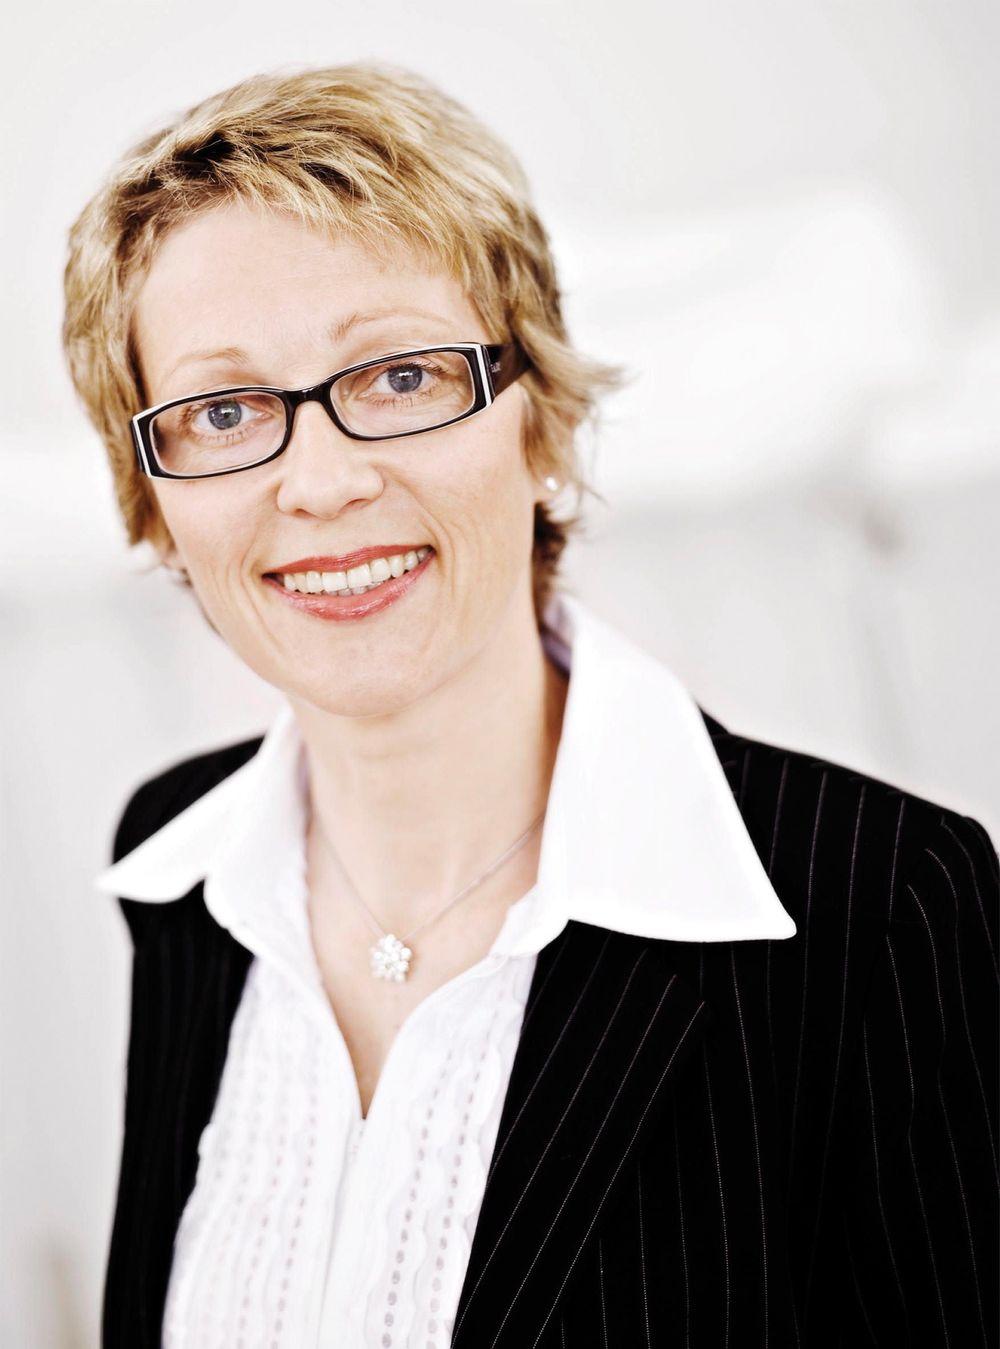 May Britt Myhr er styreleder hos NCE Instrumentation.